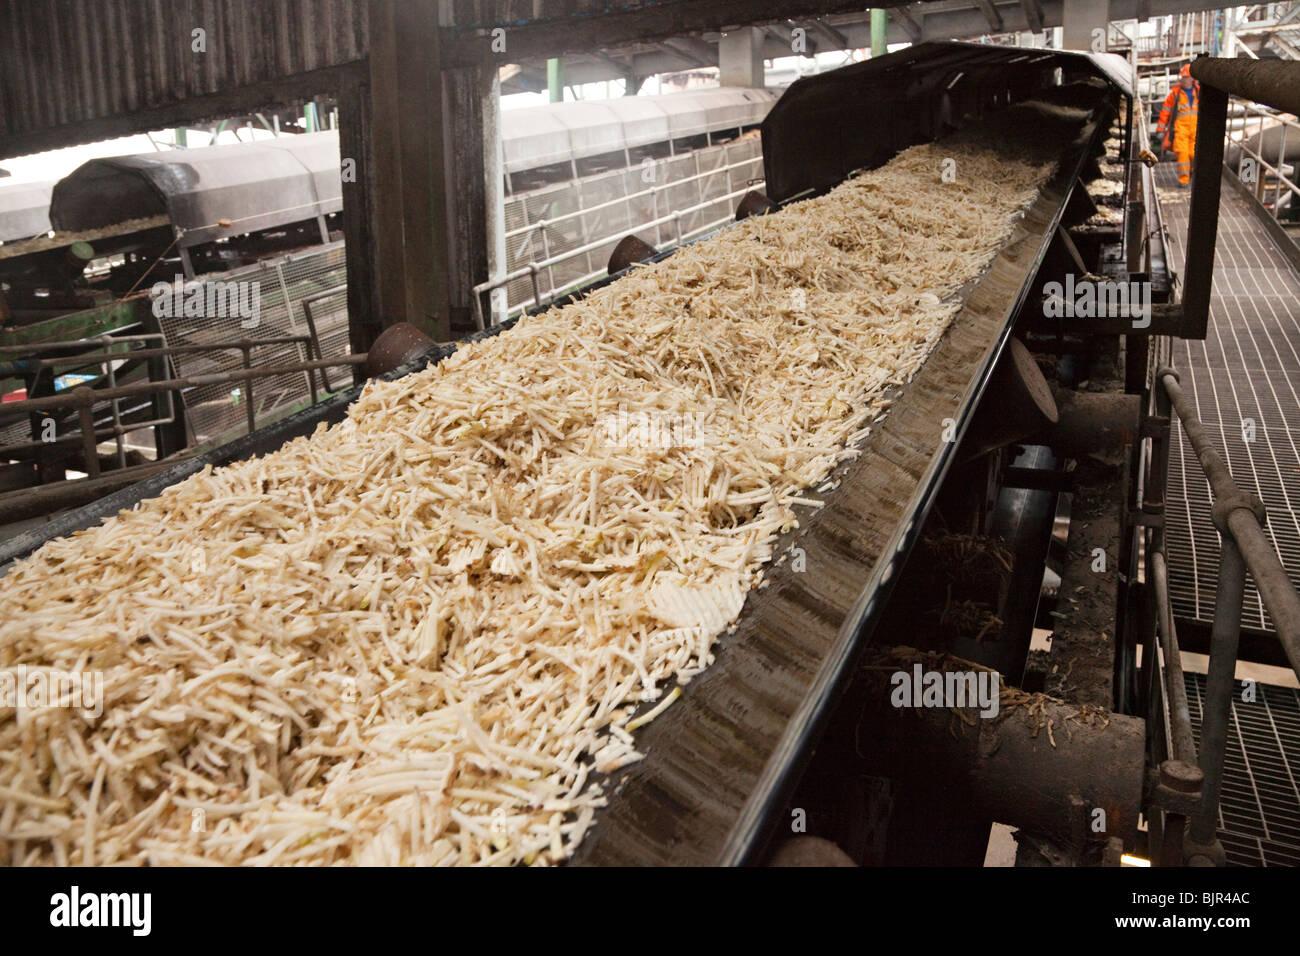 conveyor belt carrying sliced sugar beet - Stock Image